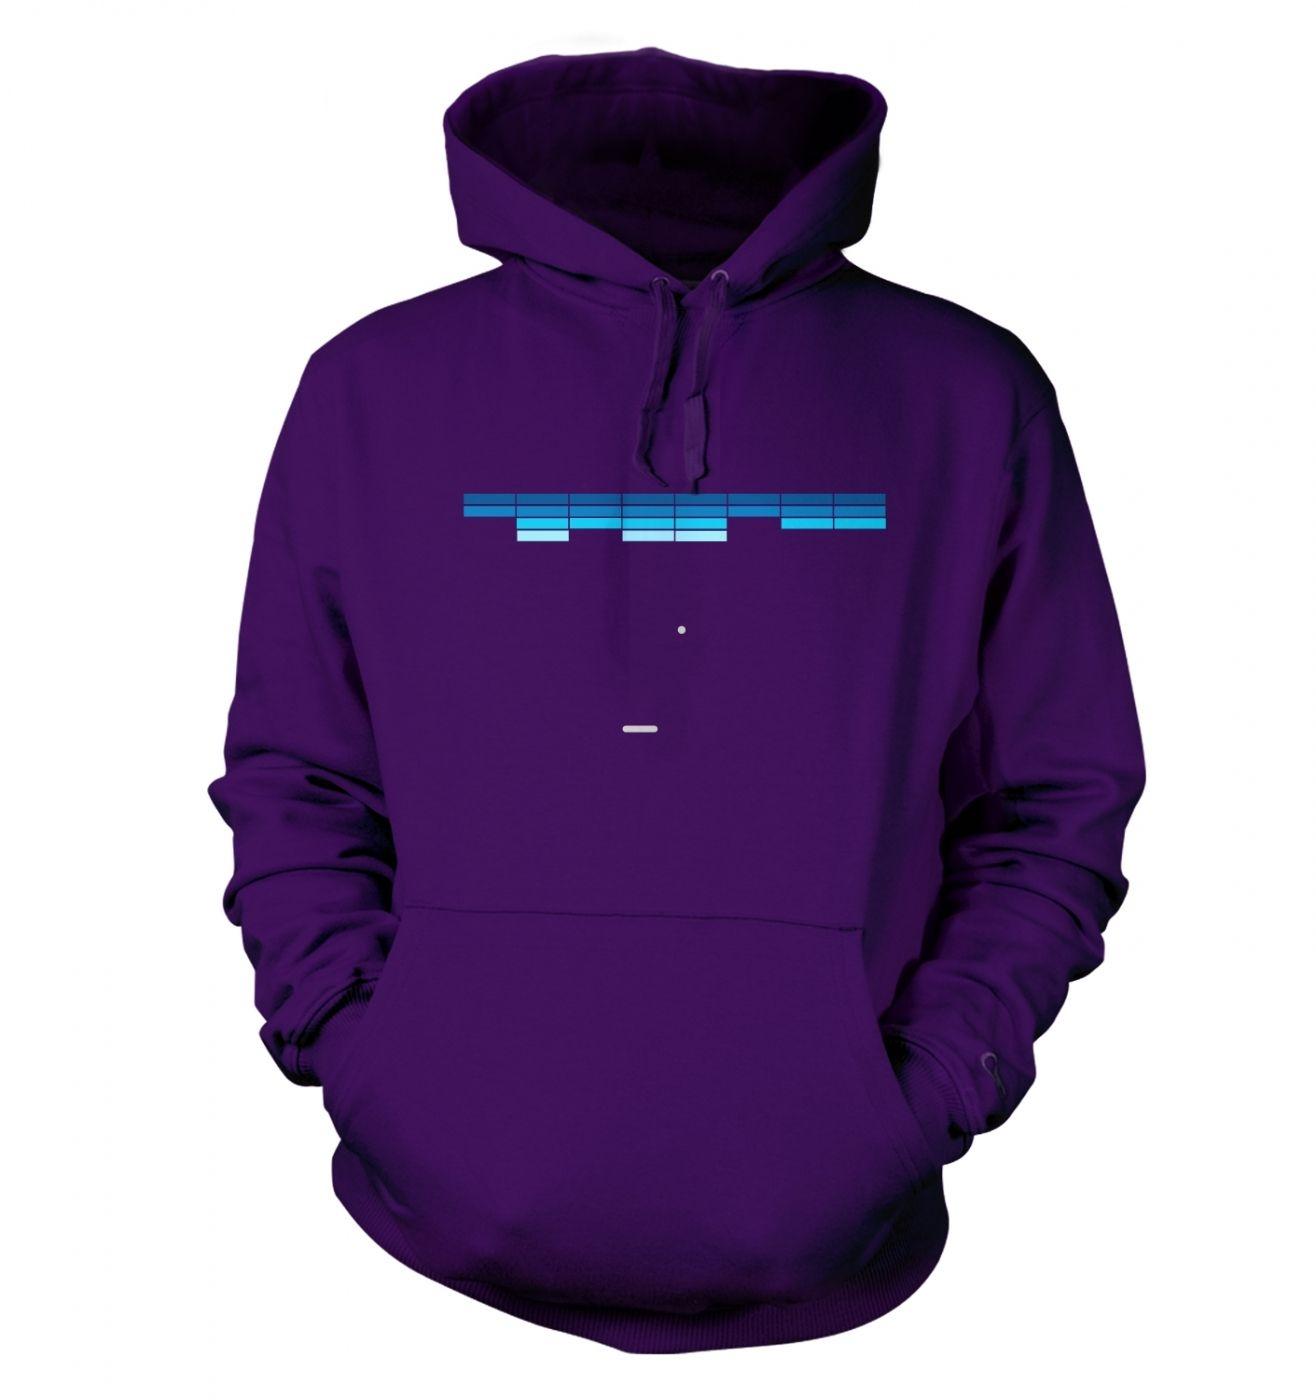 Retro Arcade Style (purple/blue) hoodie